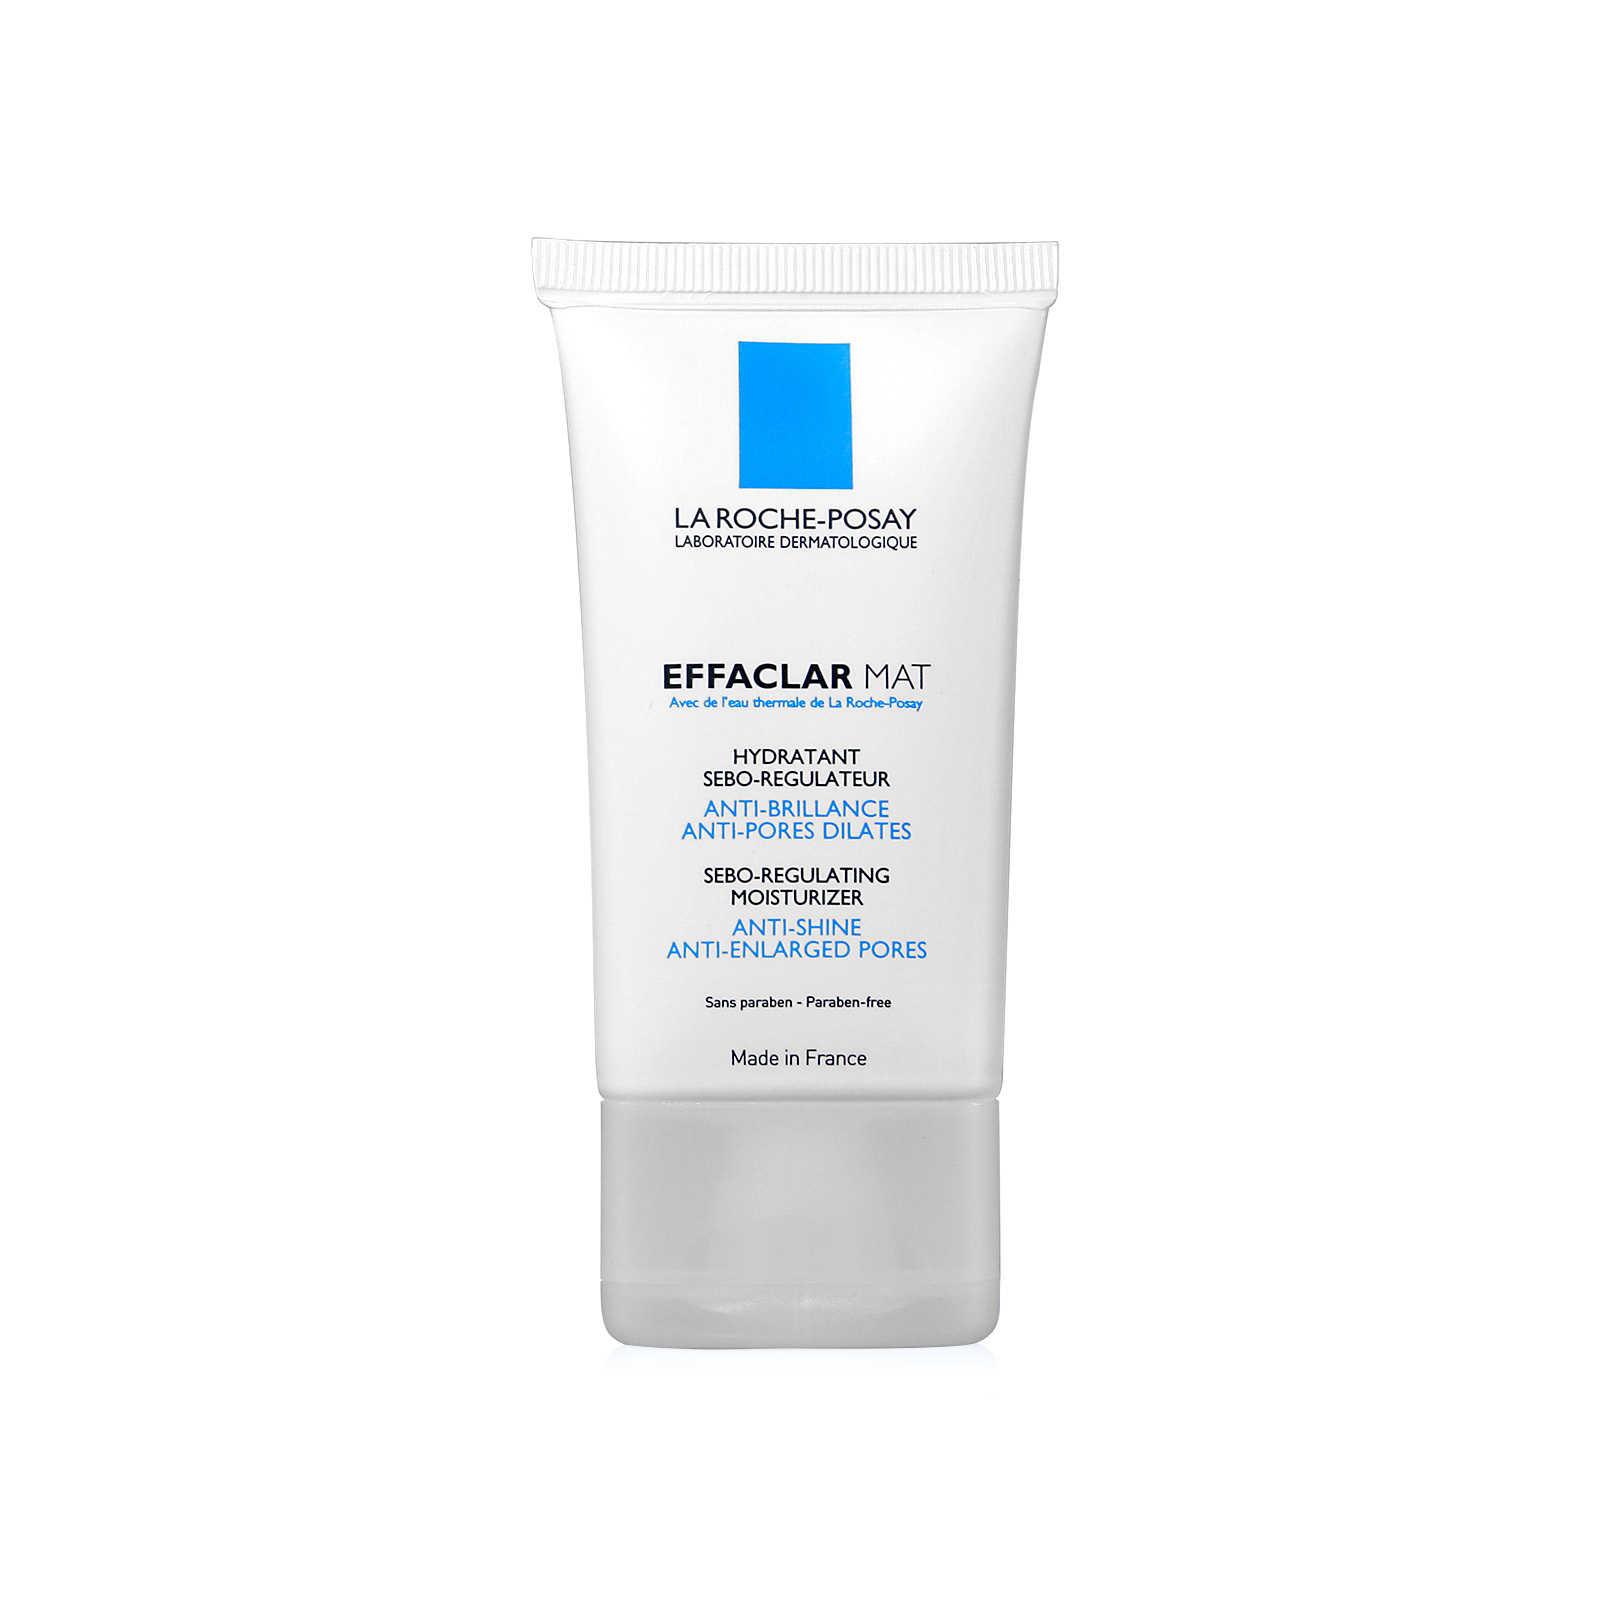 La Roche-posay - Crema Idratante Seboregolatore - Effaclar Mat